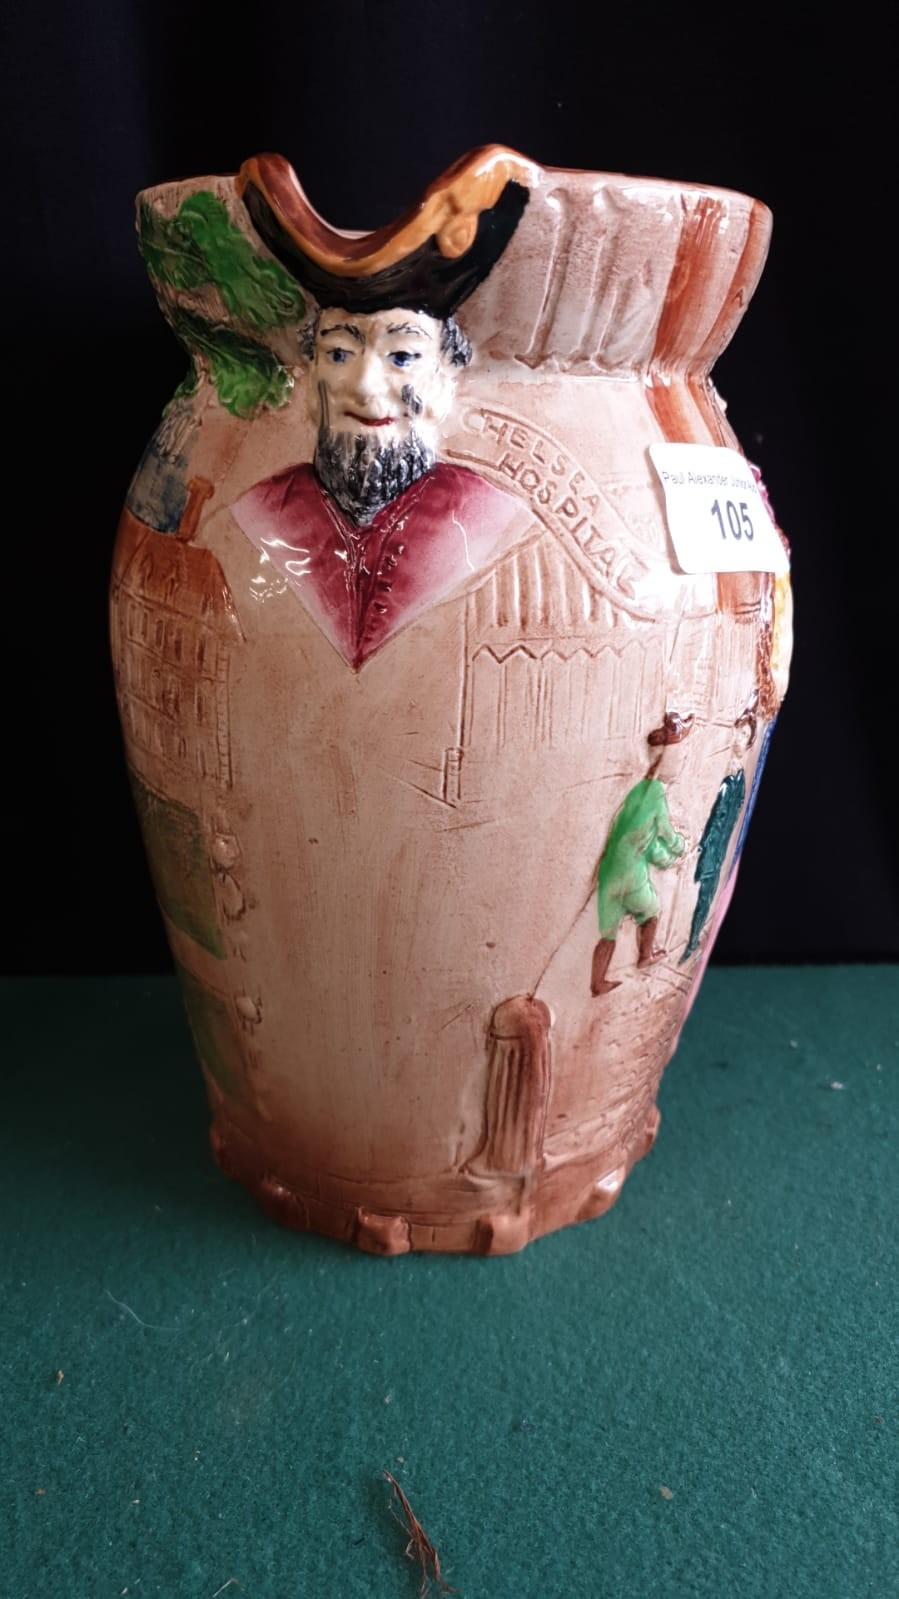 Burleigh Ware Large Nell Gwyn Water Jug. - Image 3 of 4